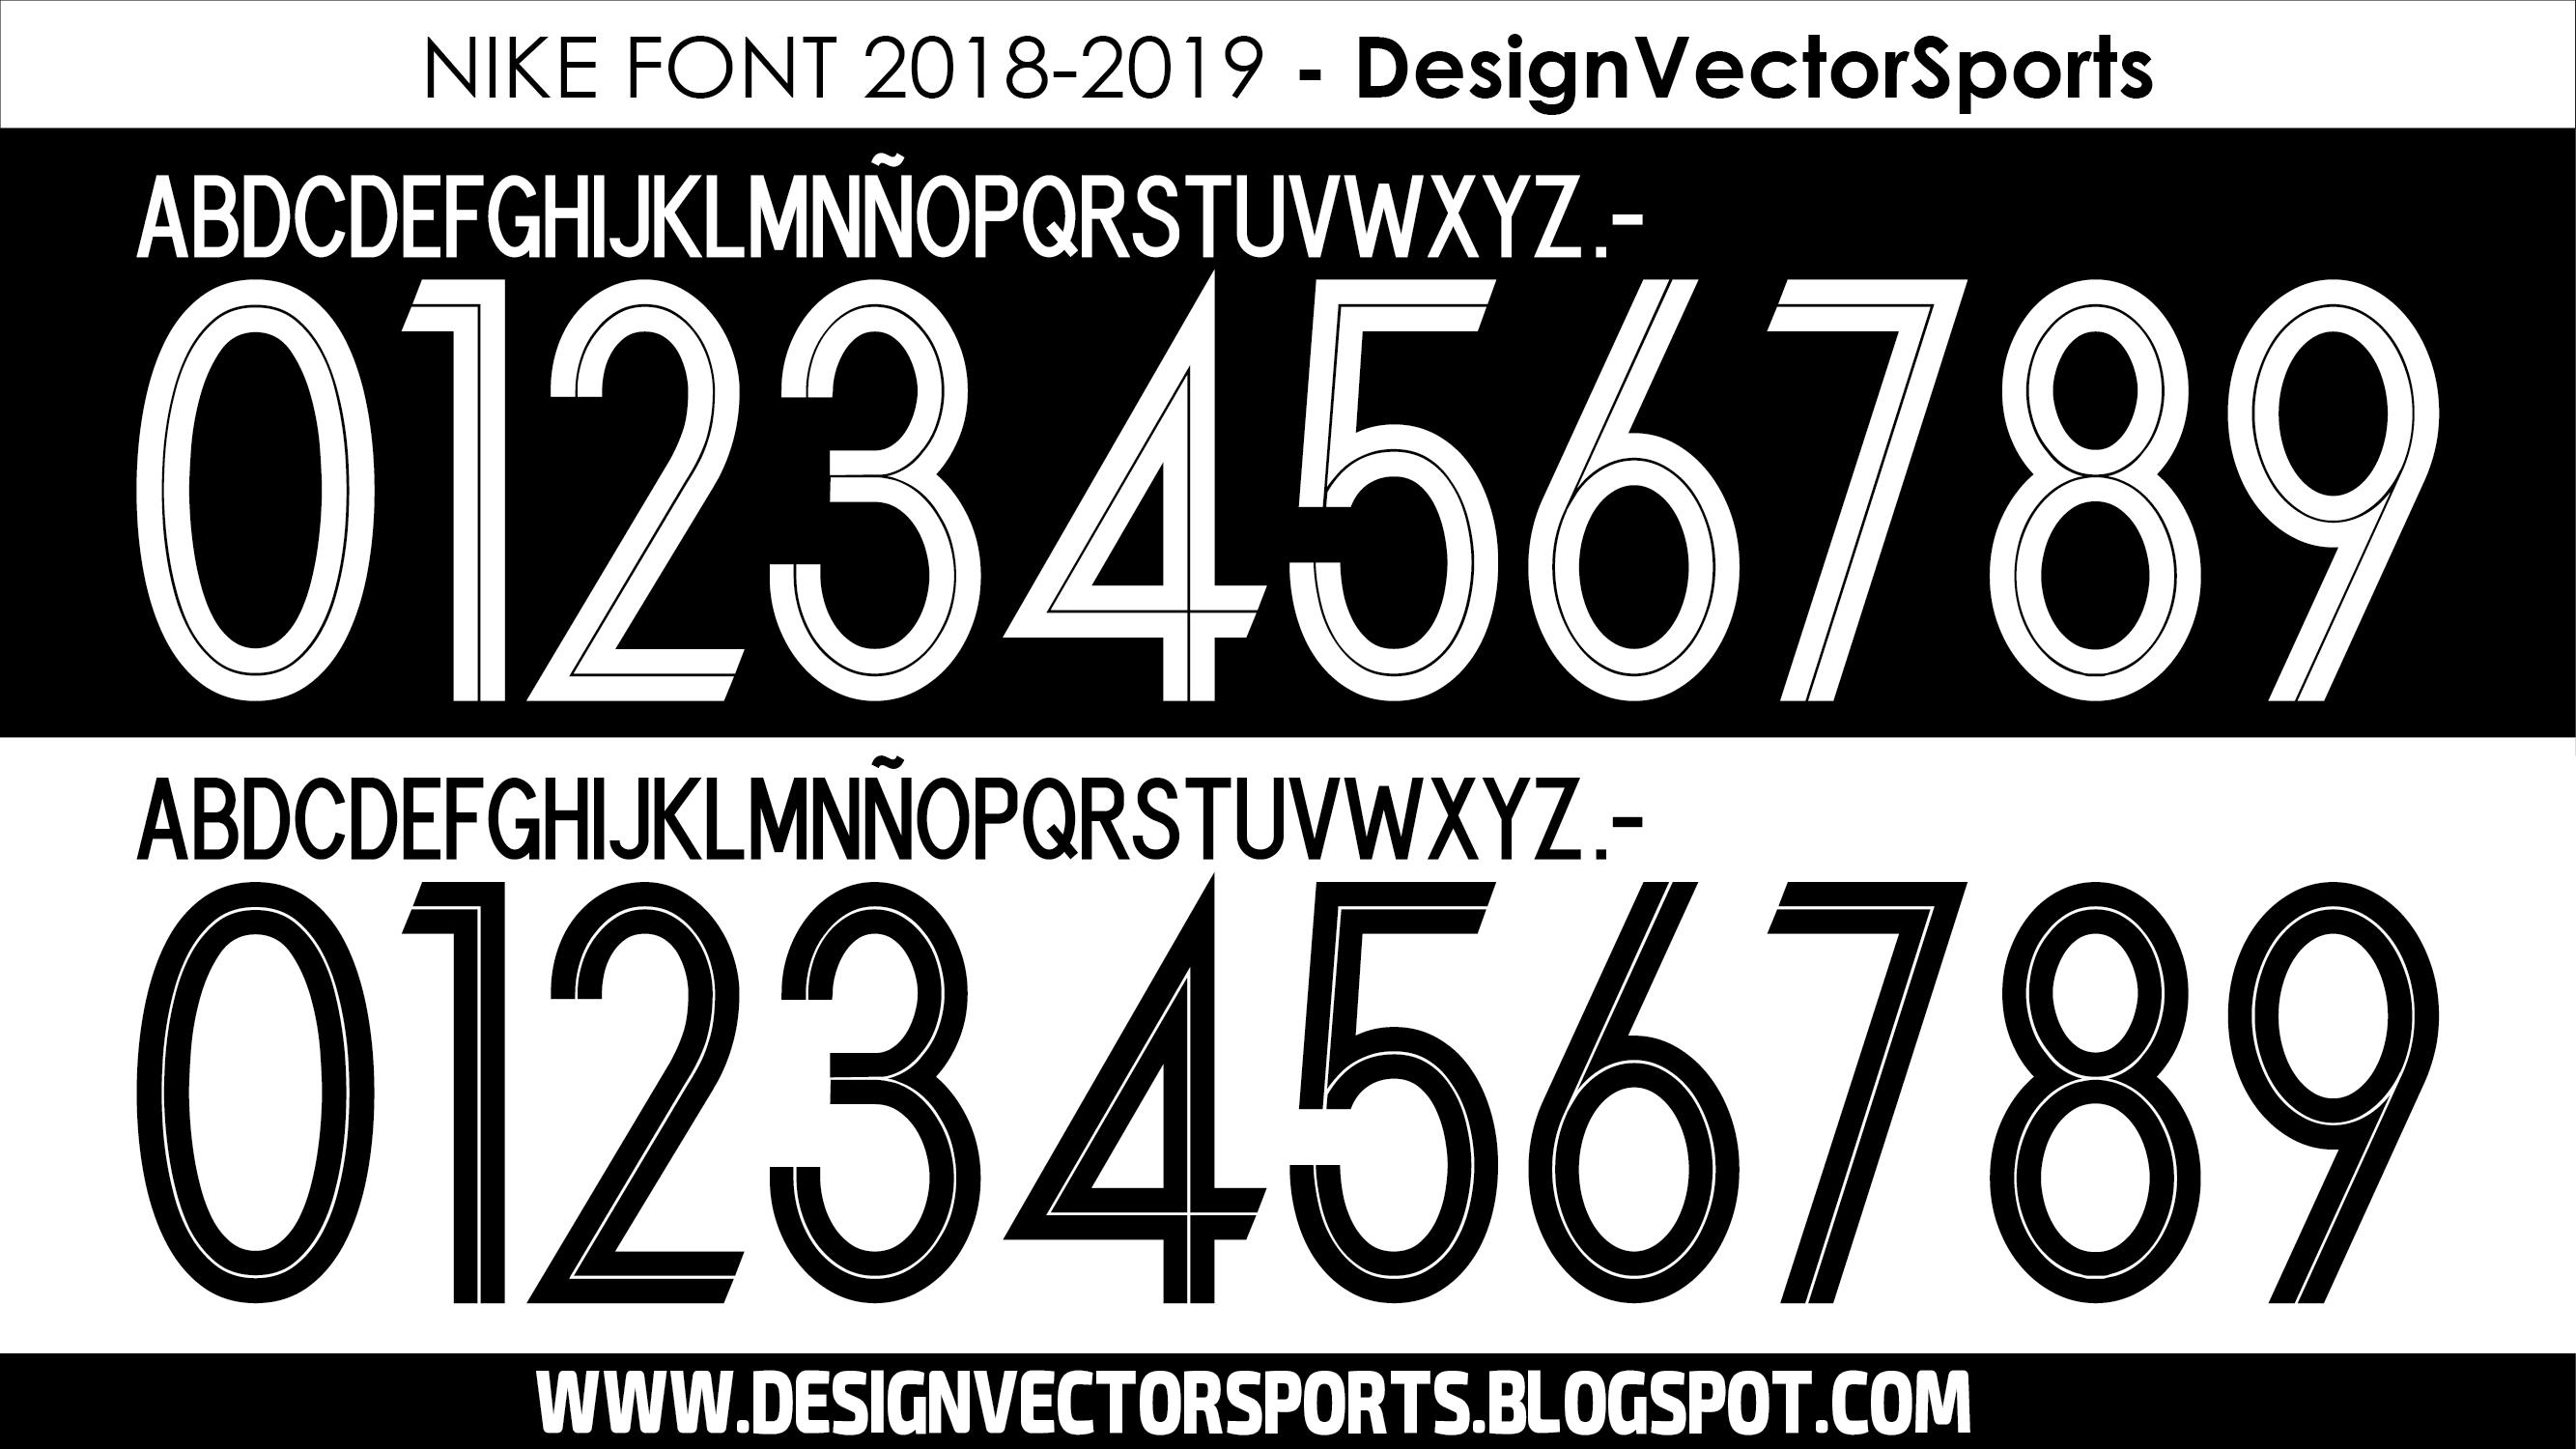 élite recibo Gracias  https://designvectorsports.blogspot.com/2018/06/nike-font-2018-2019.html |  Fuentes deportivas, Tipografía números, Fuentes